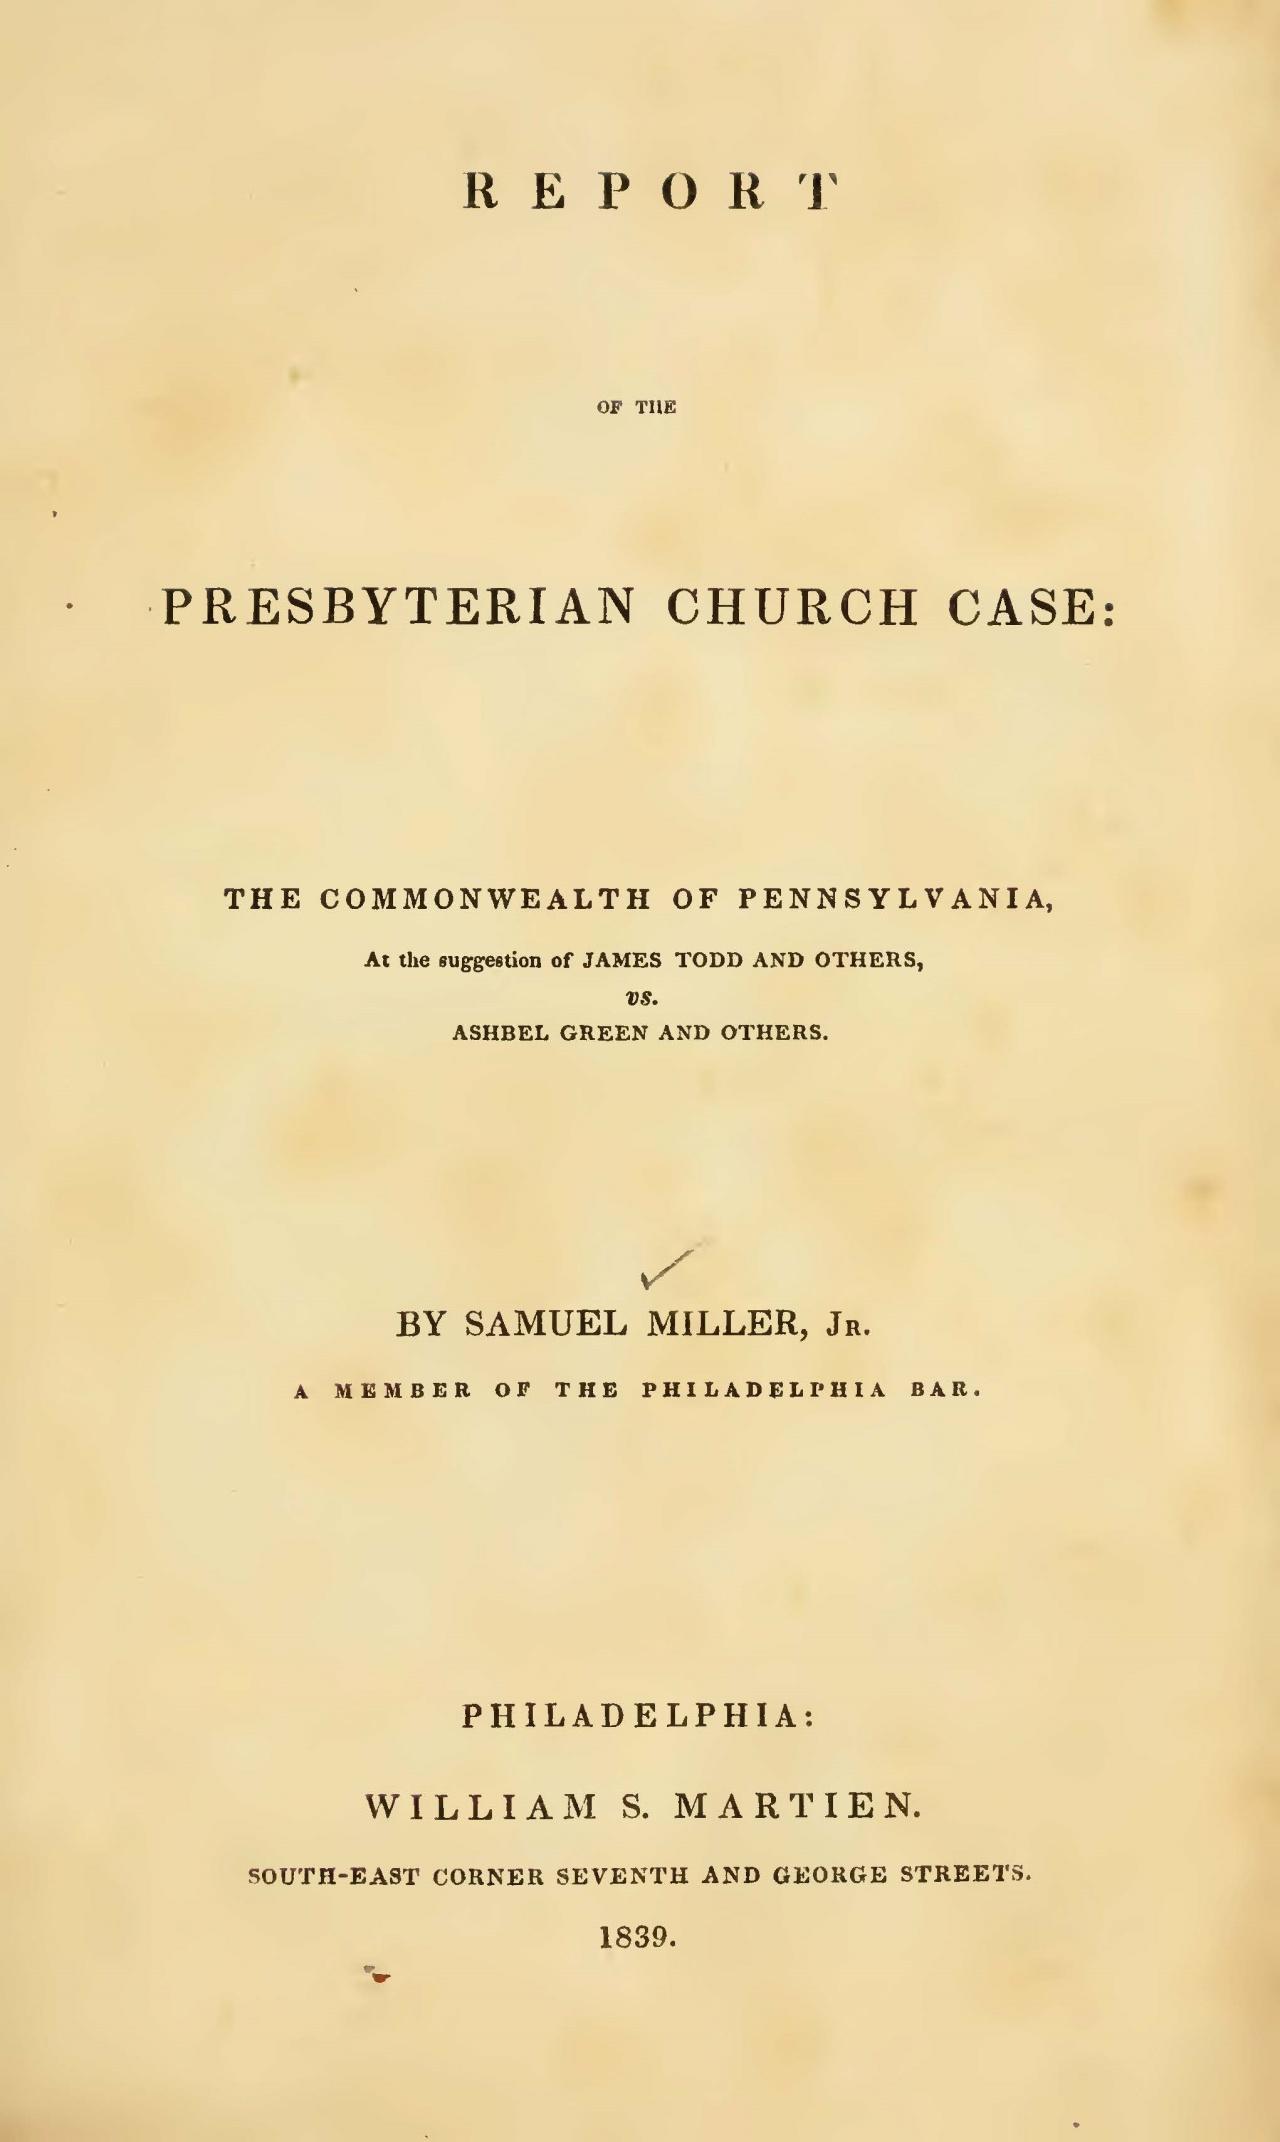 Miller, Jr., Samuel, Report of the Presbyterian Church Case Title Page.jpg